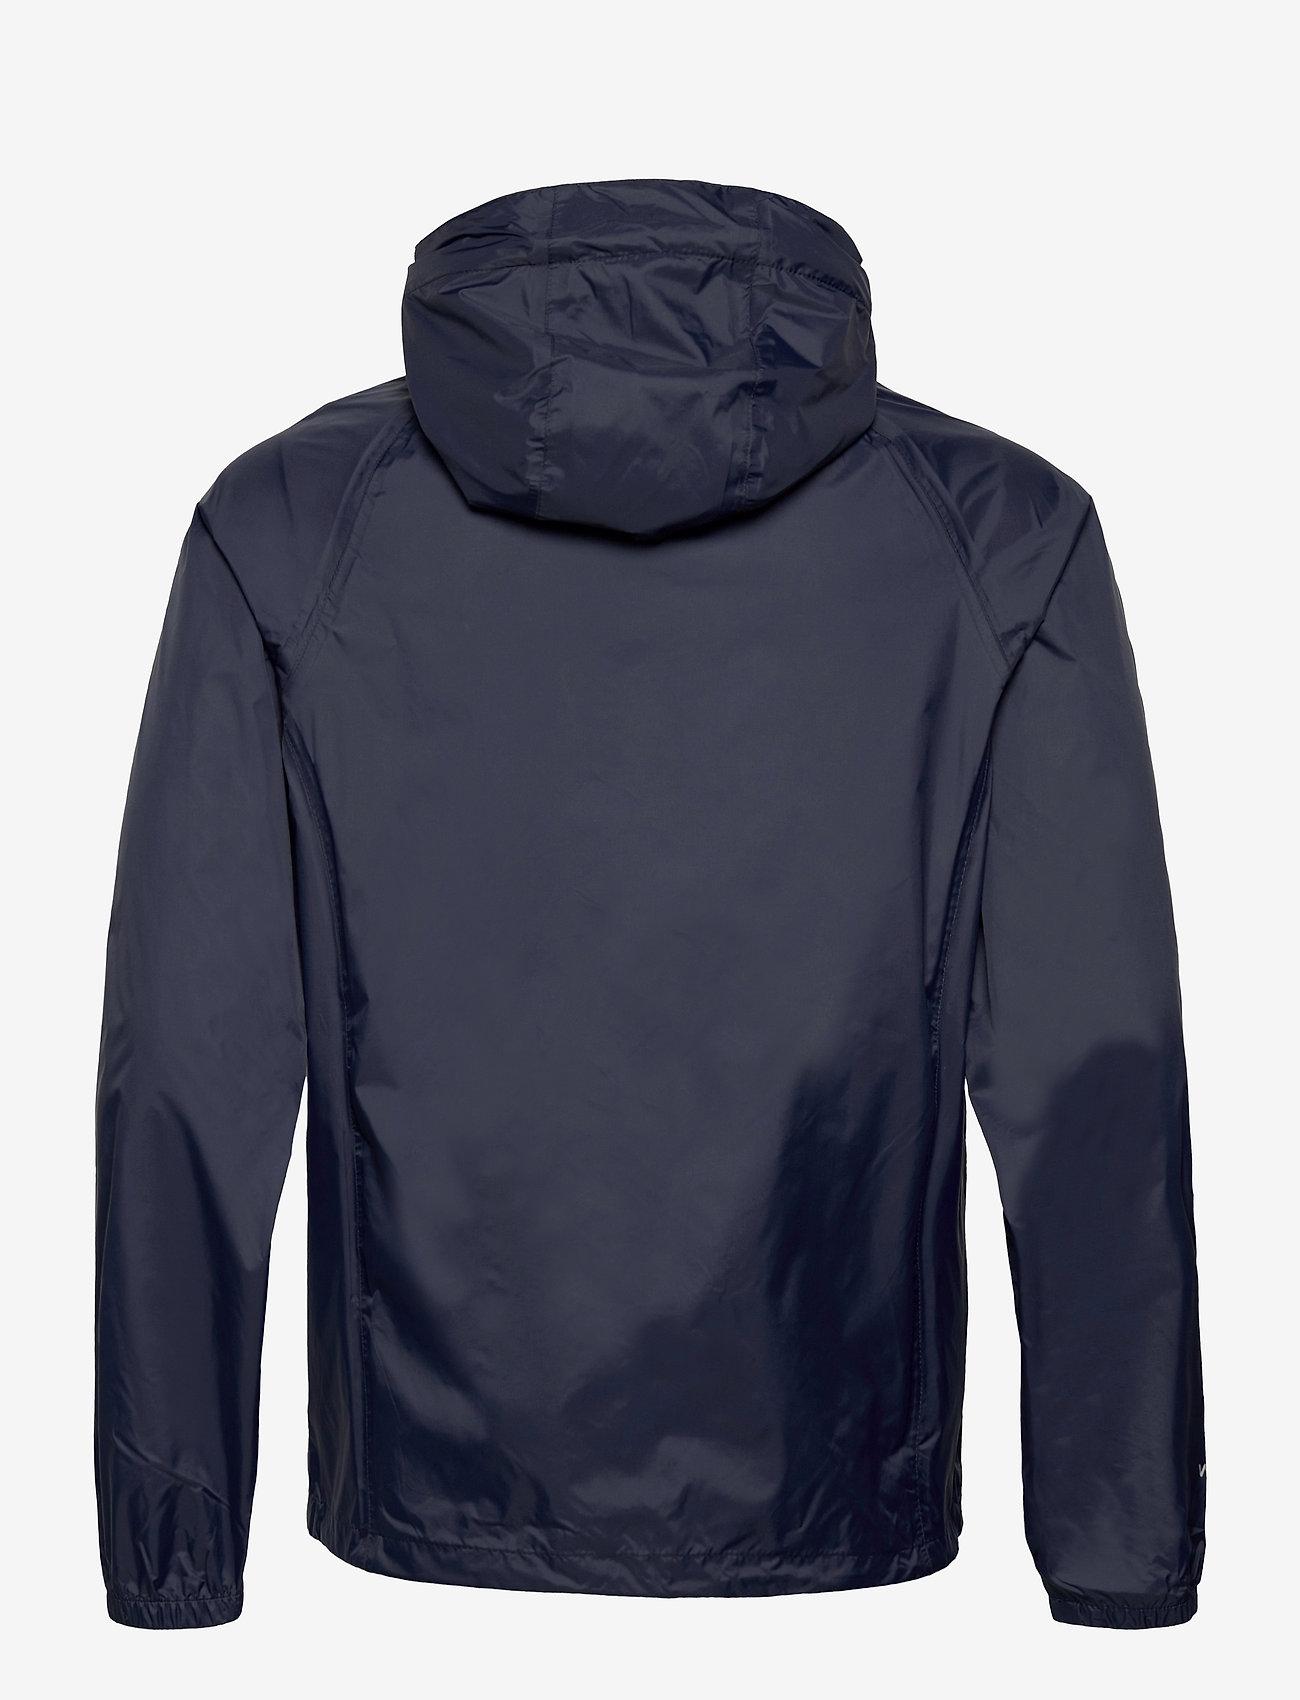 Weather Report - Morisee Unisex Packable AWG Jacket W-PRO 10000 - kurtki i płaszcze - navy blazer - 1